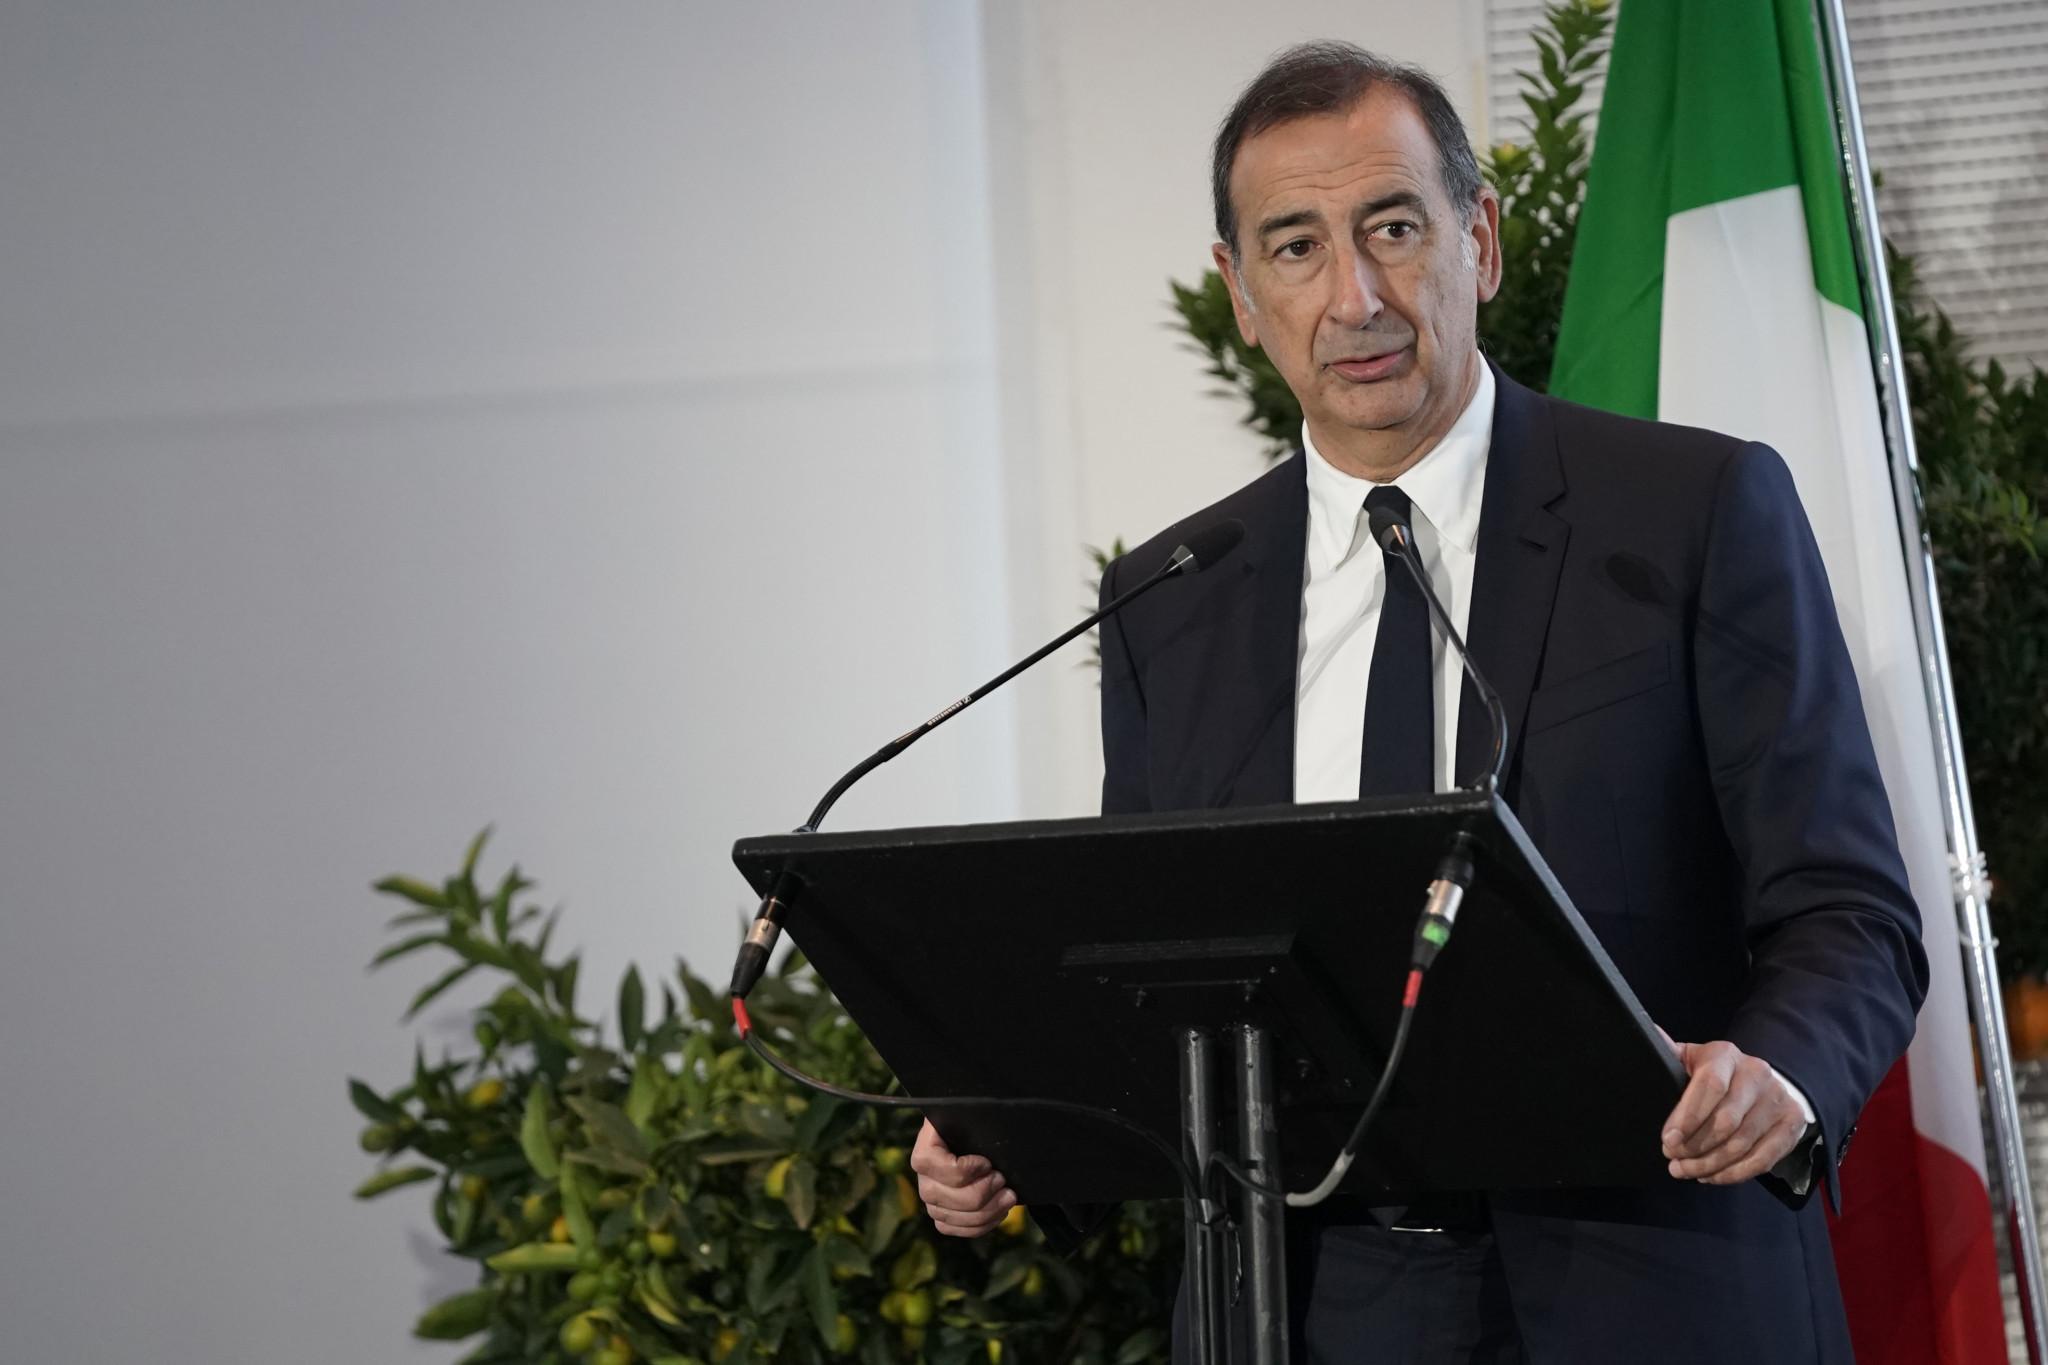 San Siro project on hold as Milan Mayor seeks clarification on Inter's ownership future